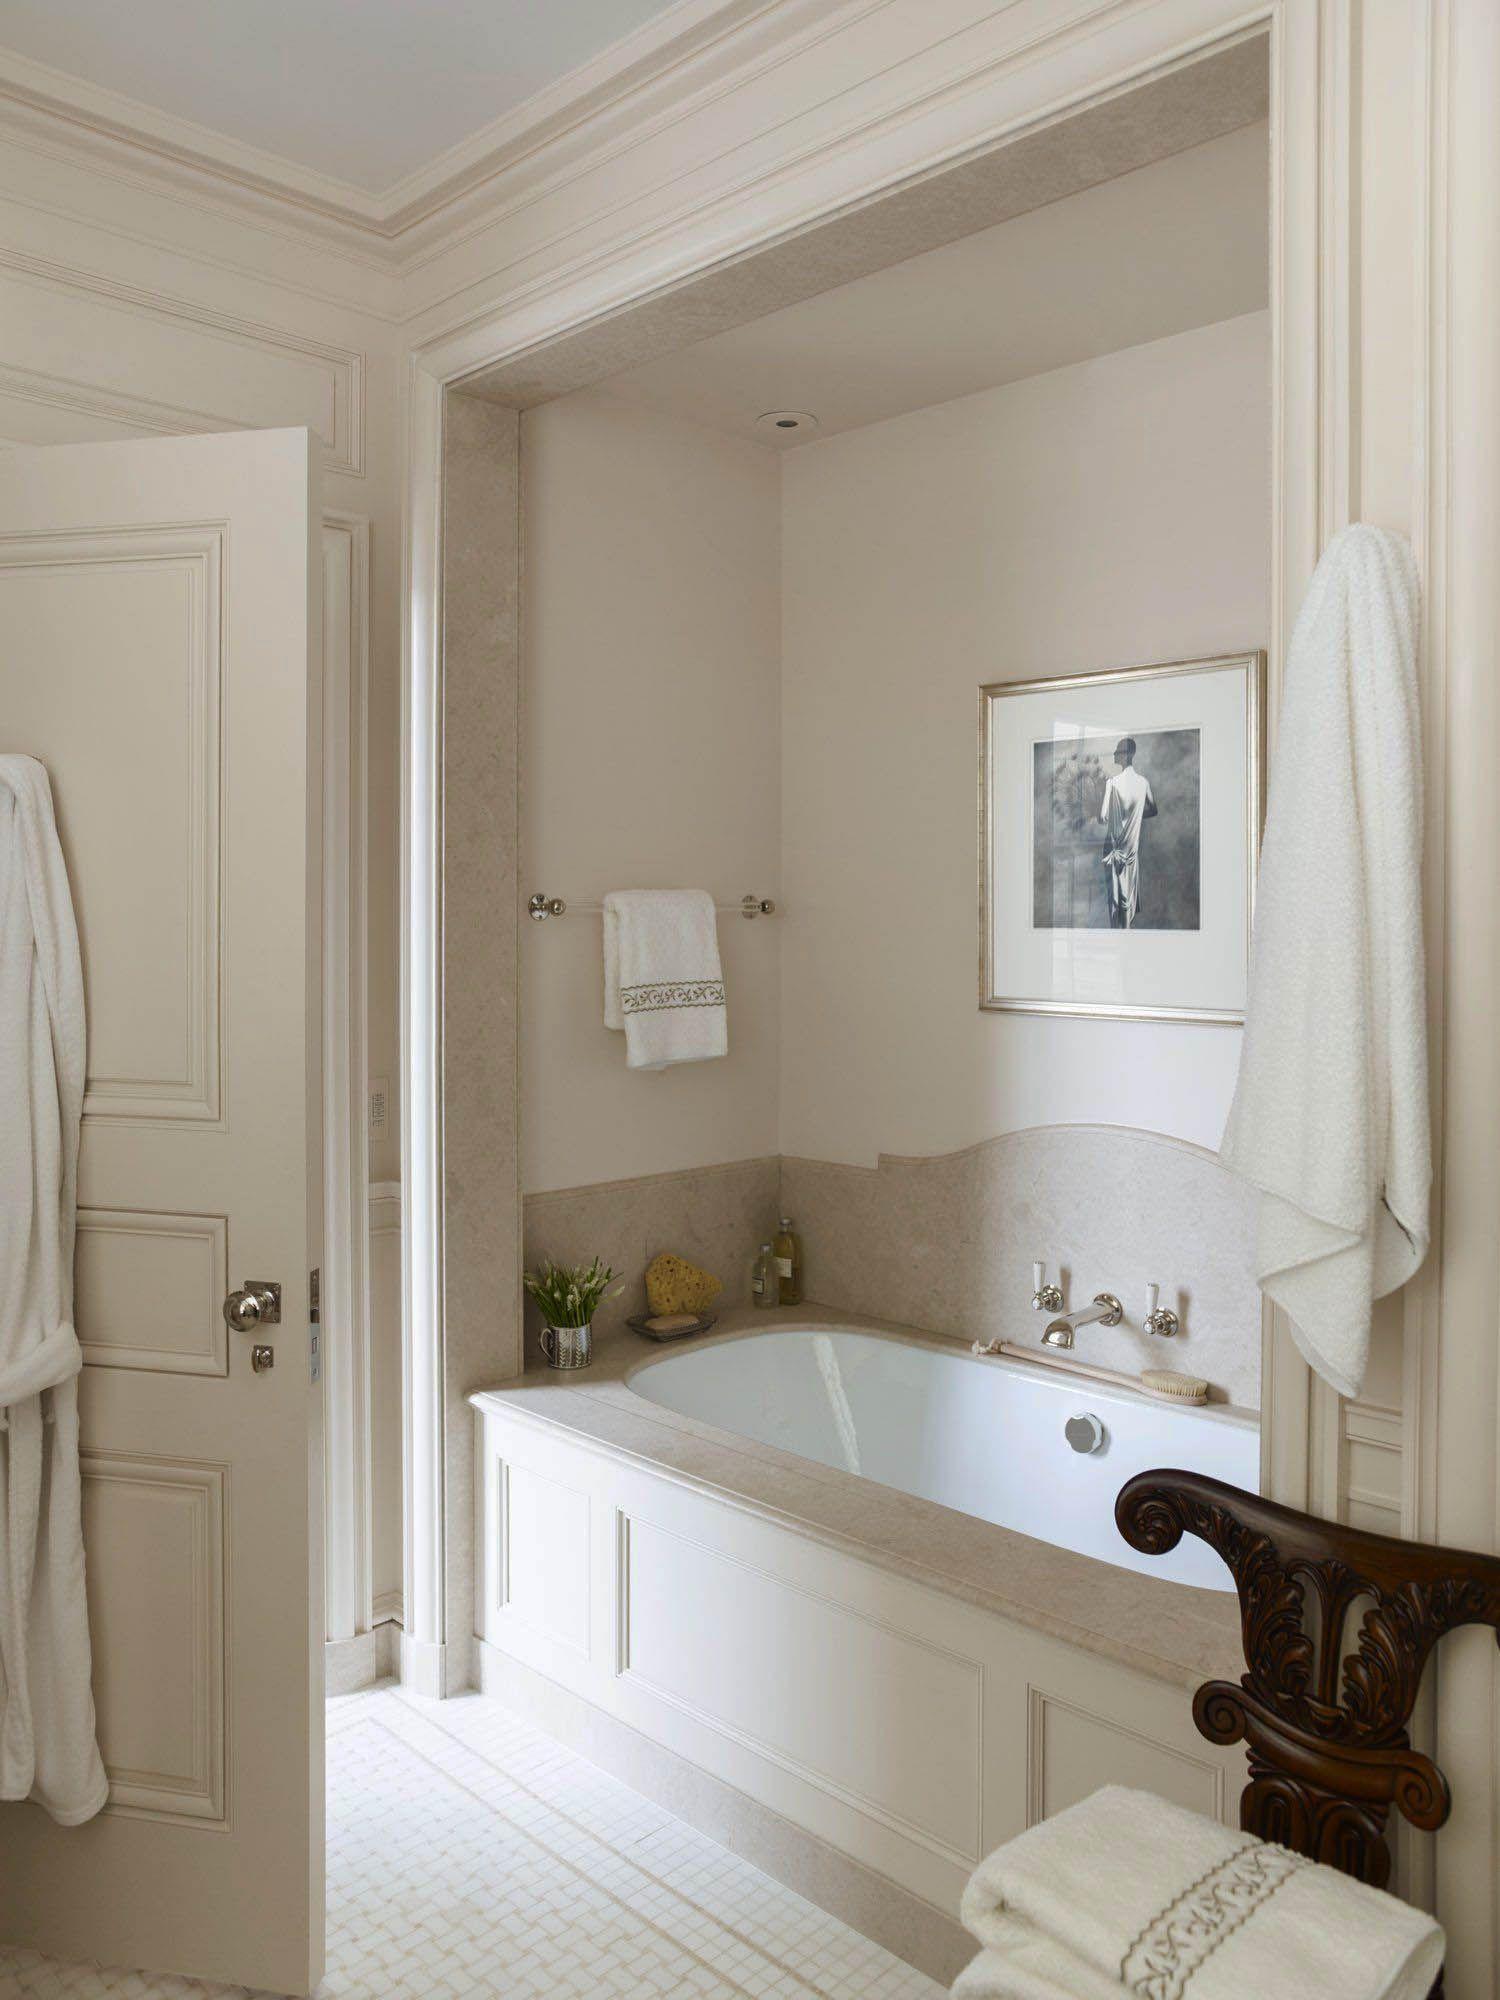 30 Delightful Traditional Bathroom Design Ideas To Not Miss In 2020 Traditional Bathroom Bathroom Interior Design Traditional Bathroom Designs